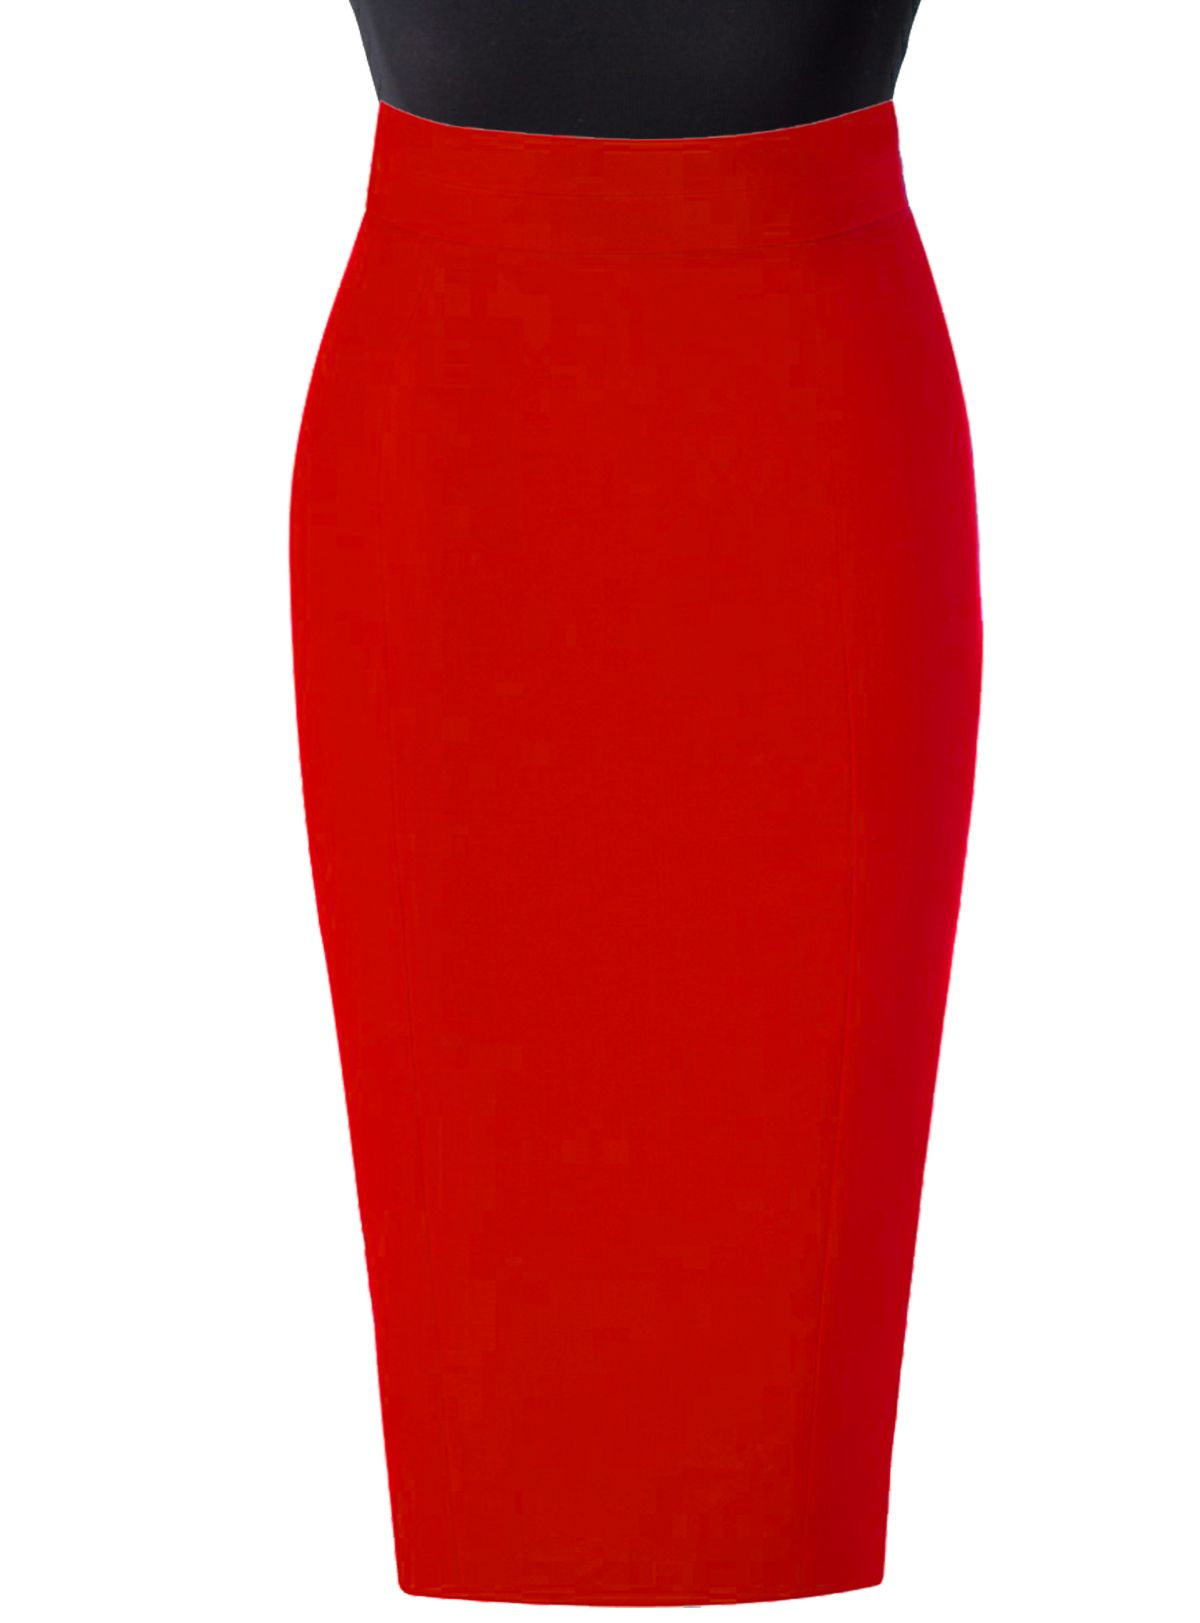 Red Linen High waist pencil skirt | Elizabeth's Custom Skirts ...